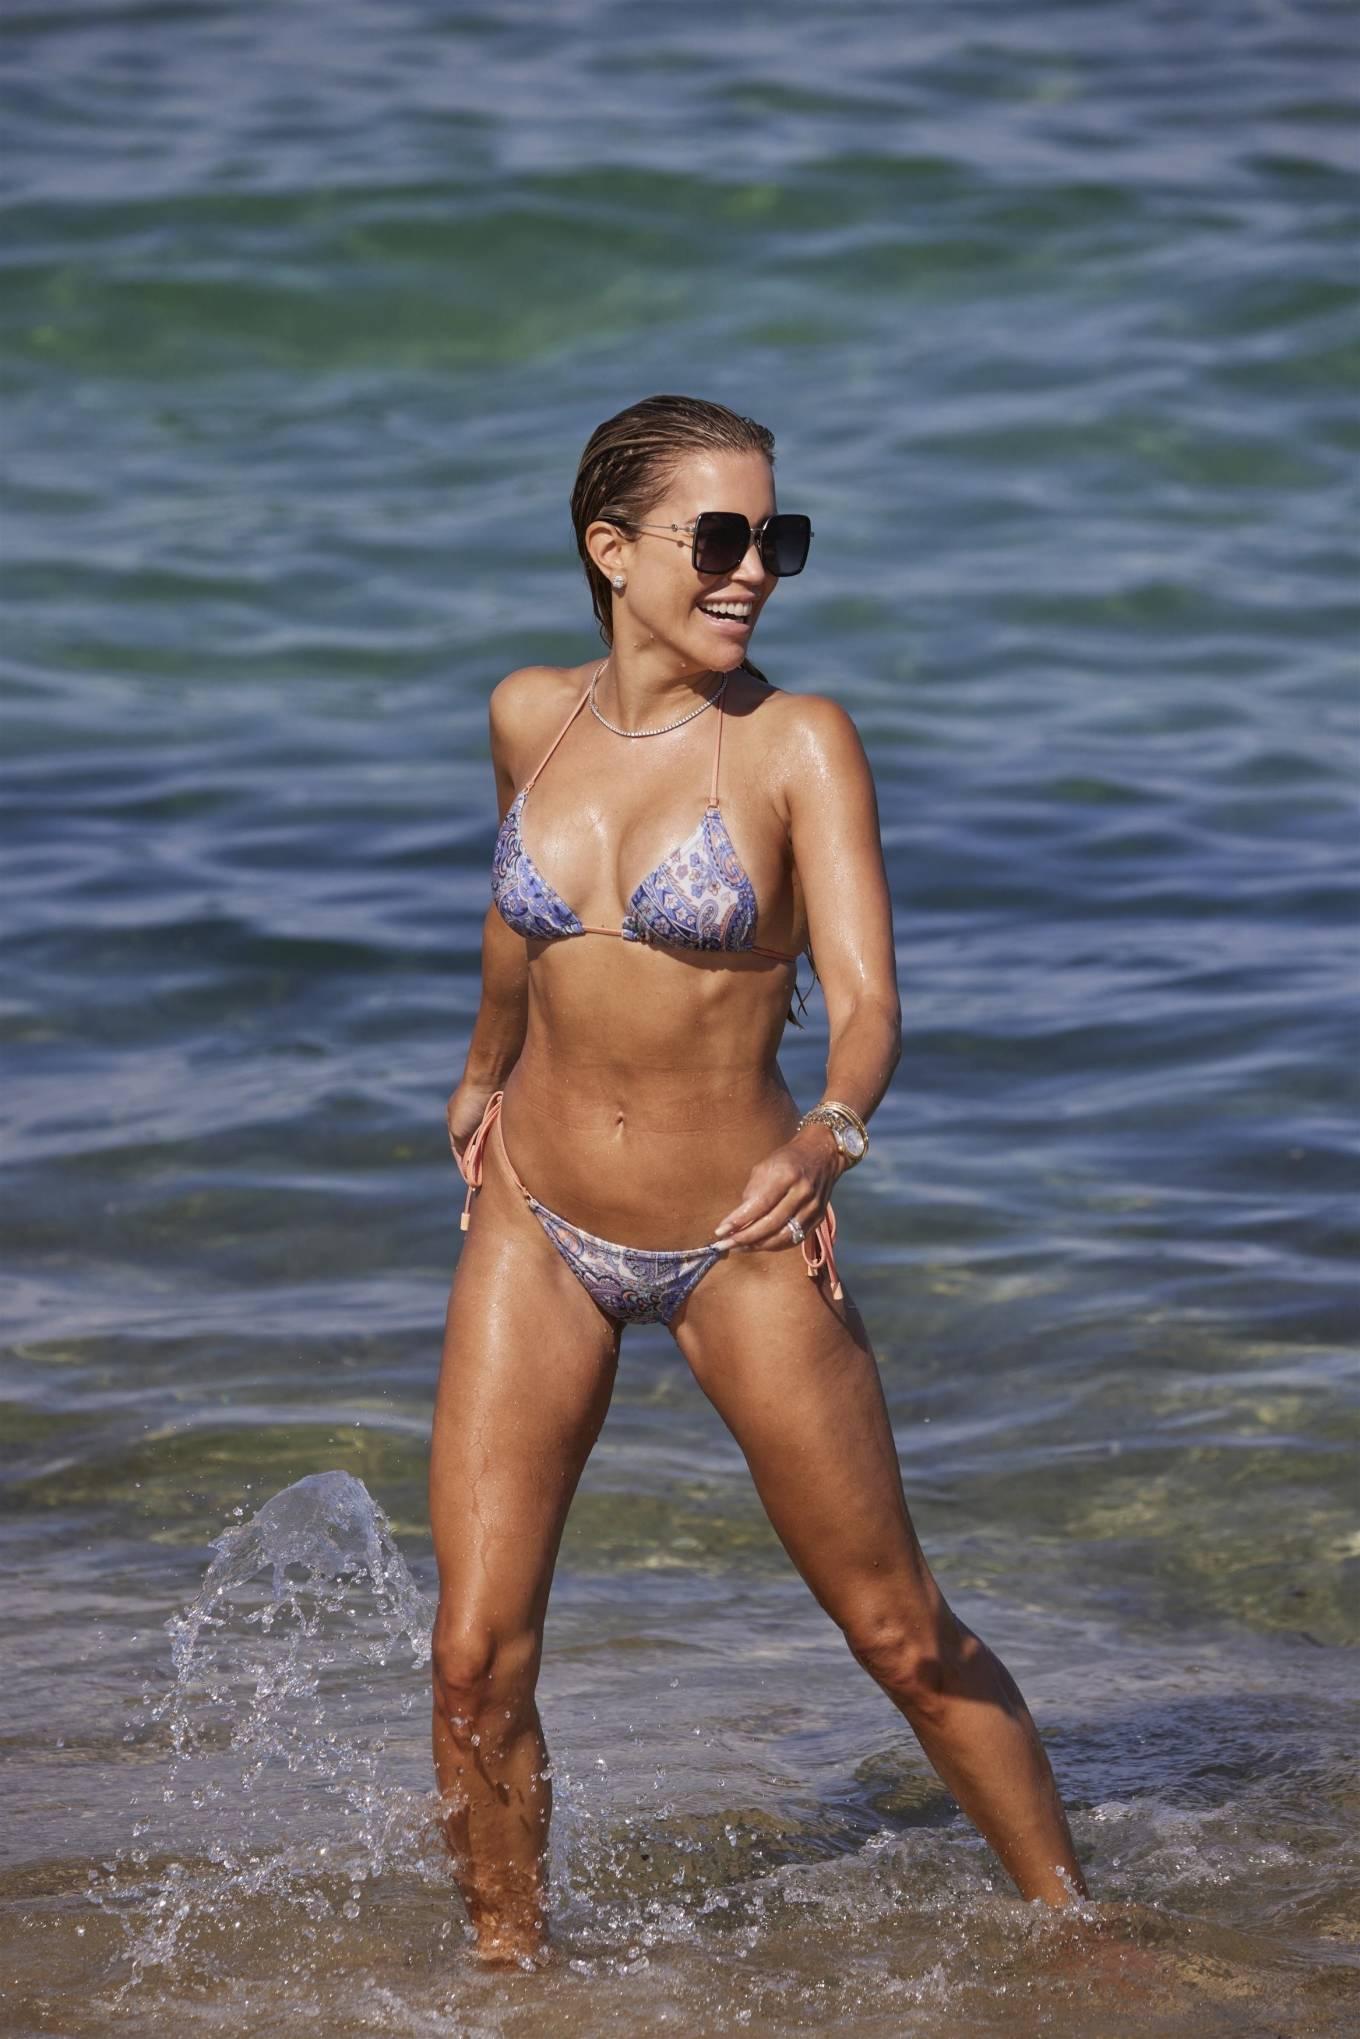 Sylvie Meis 2021 : Sylvie Meis – In a bikini with her husband Niclas Castello on the beach La Réserve in Ramatuelle-14